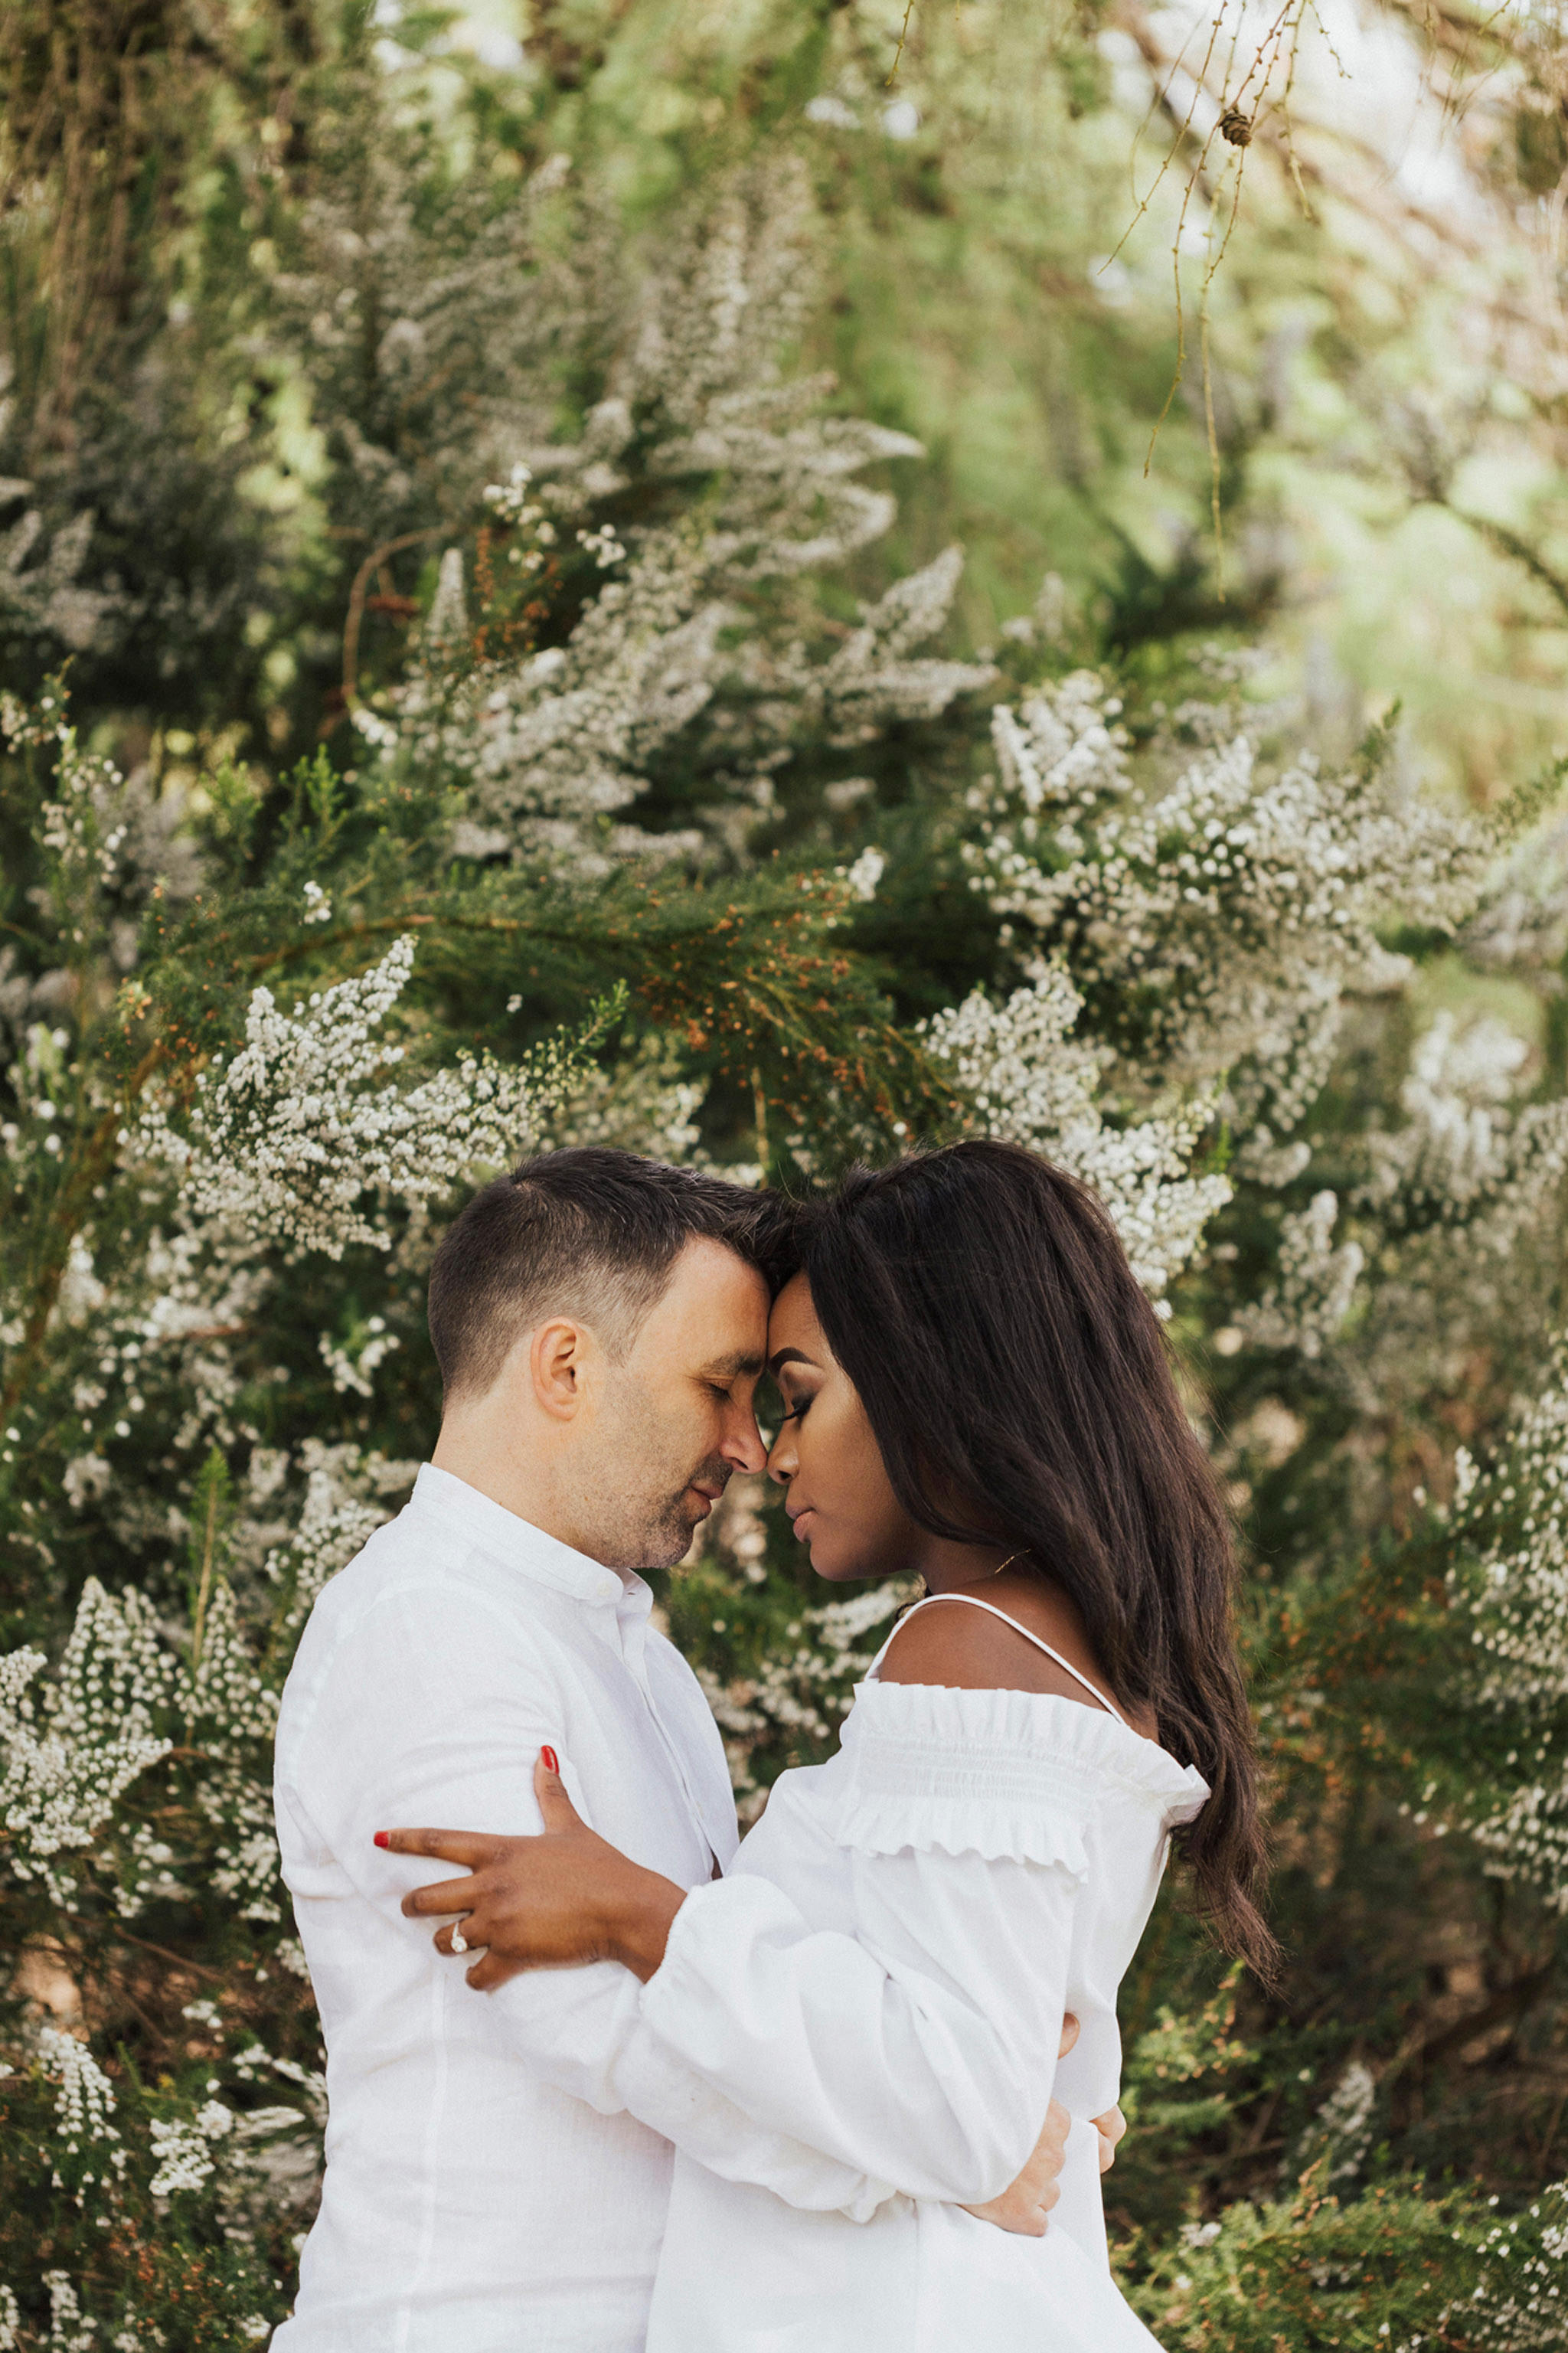 dundee-engagement-wedding-photographer-12.jpg